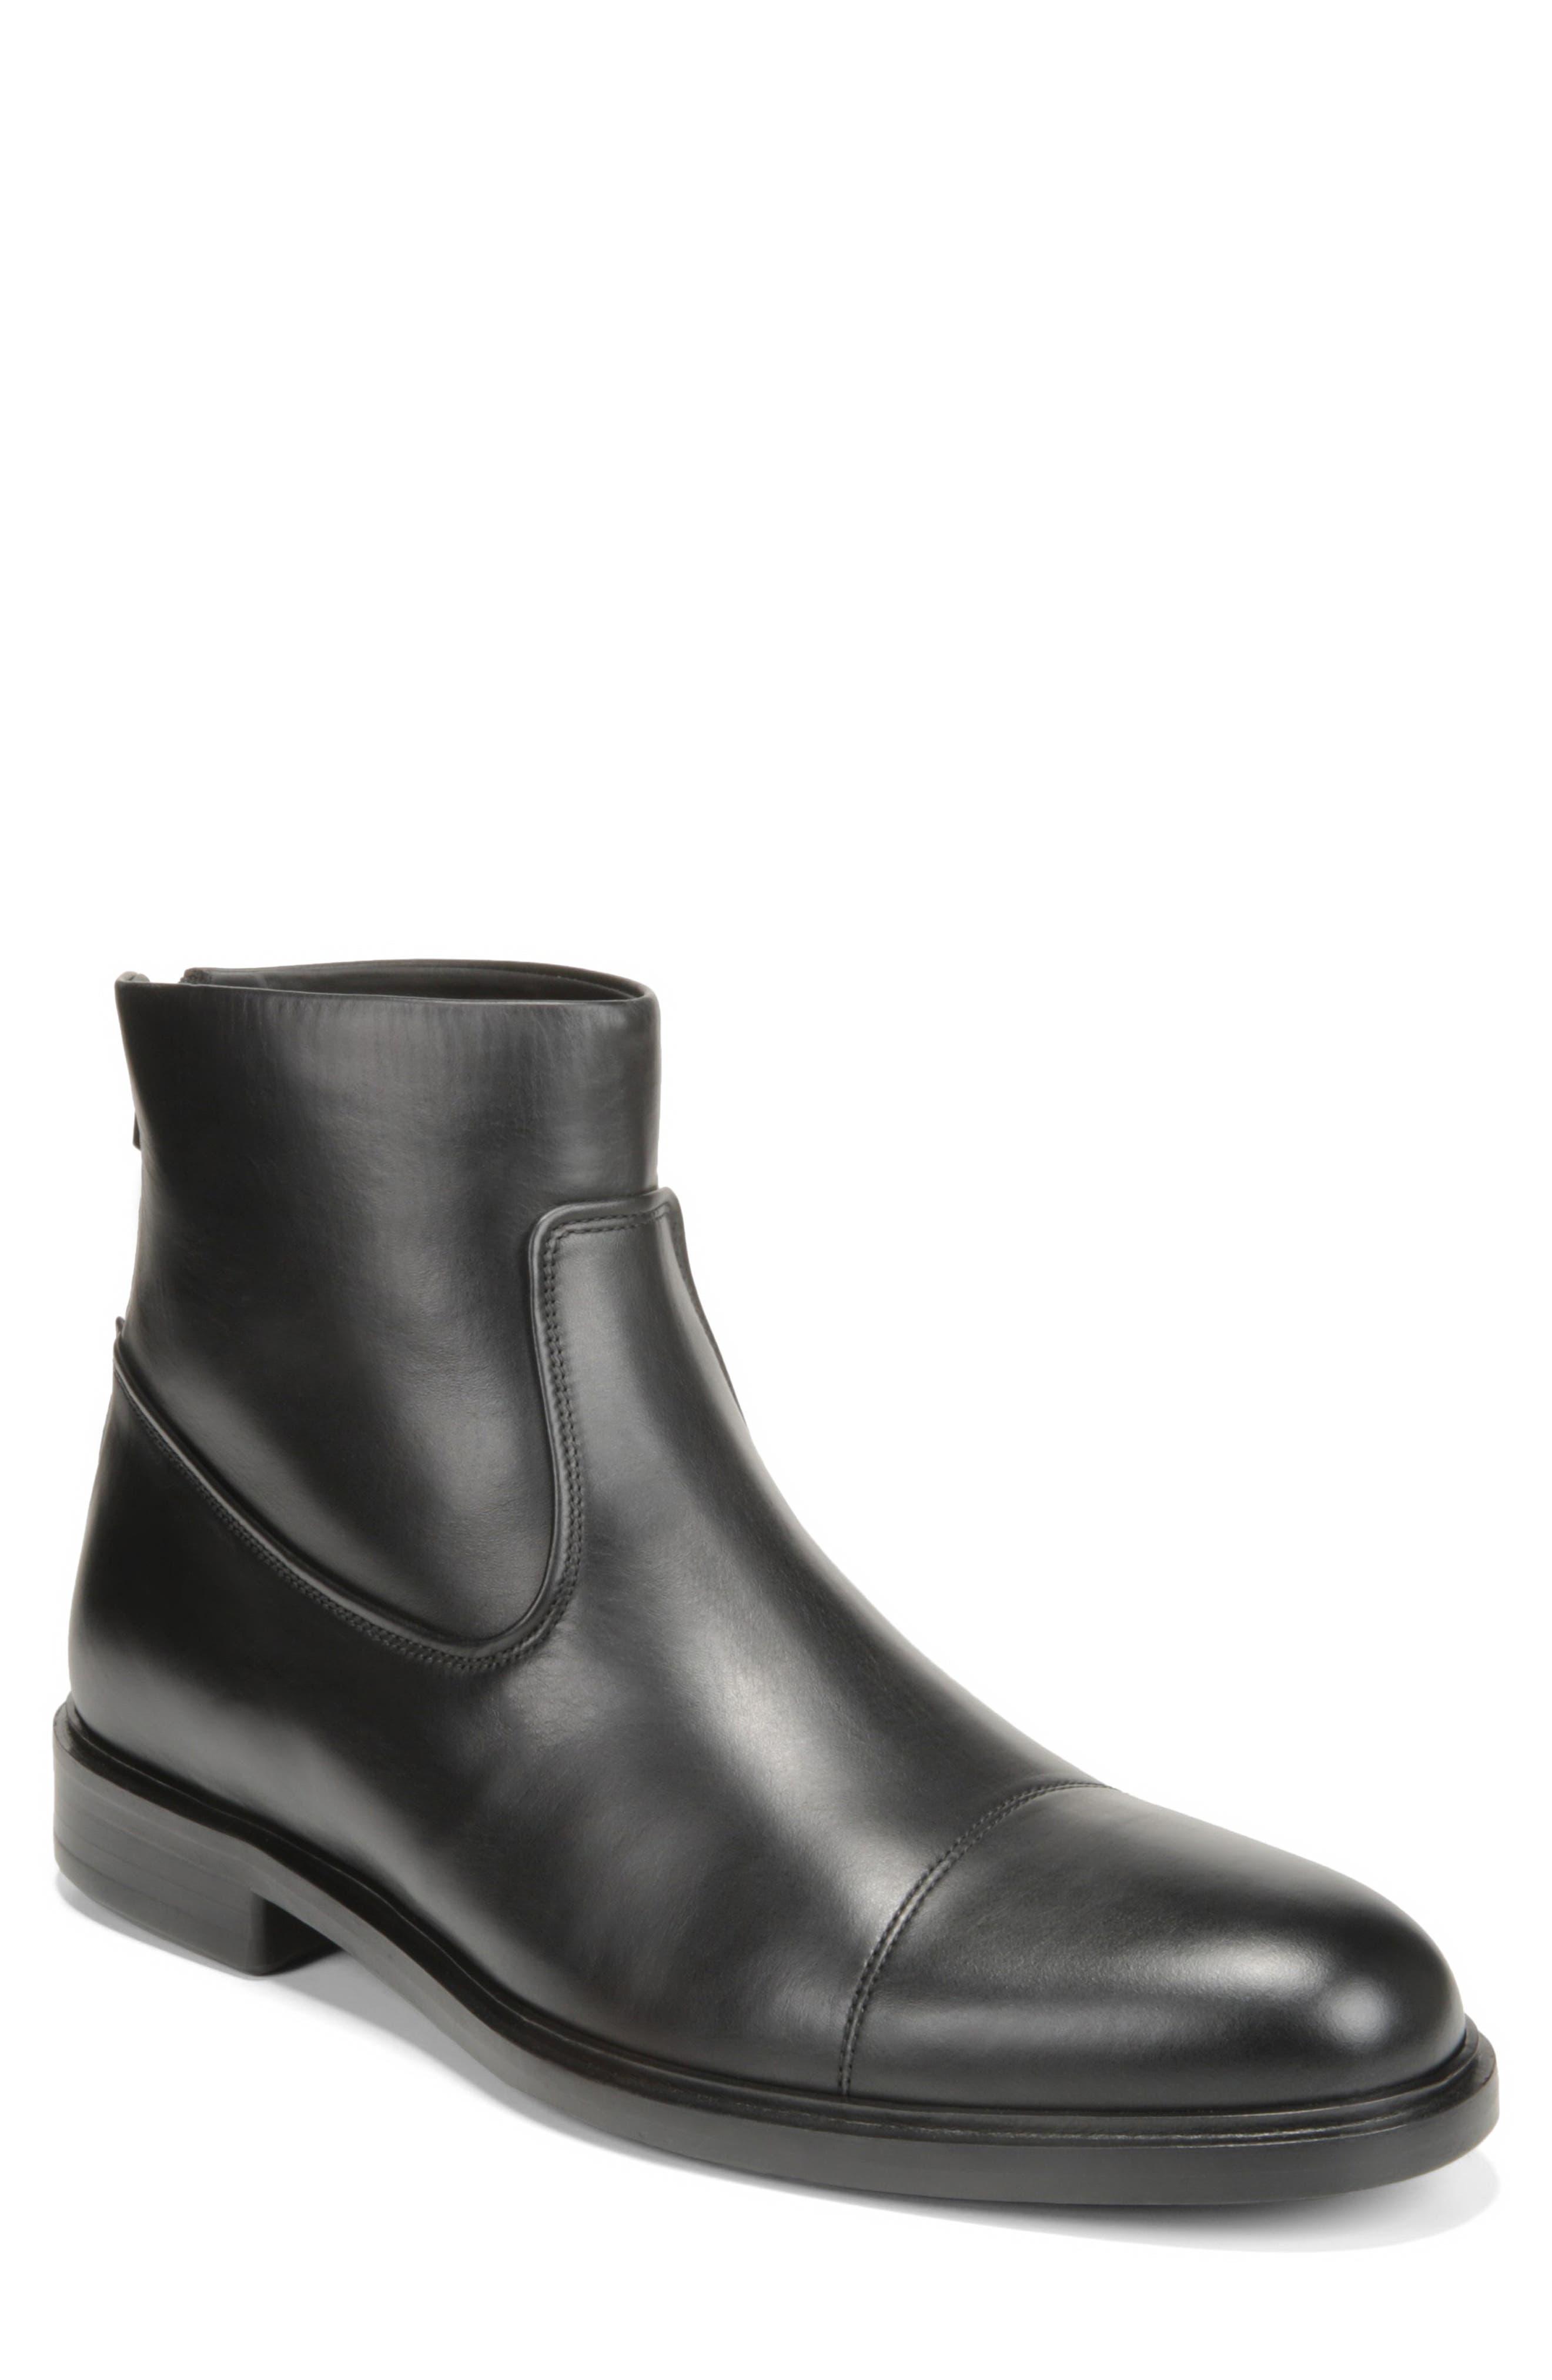 Beckett Zip Boot,                             Main thumbnail 1, color,                             BLACK